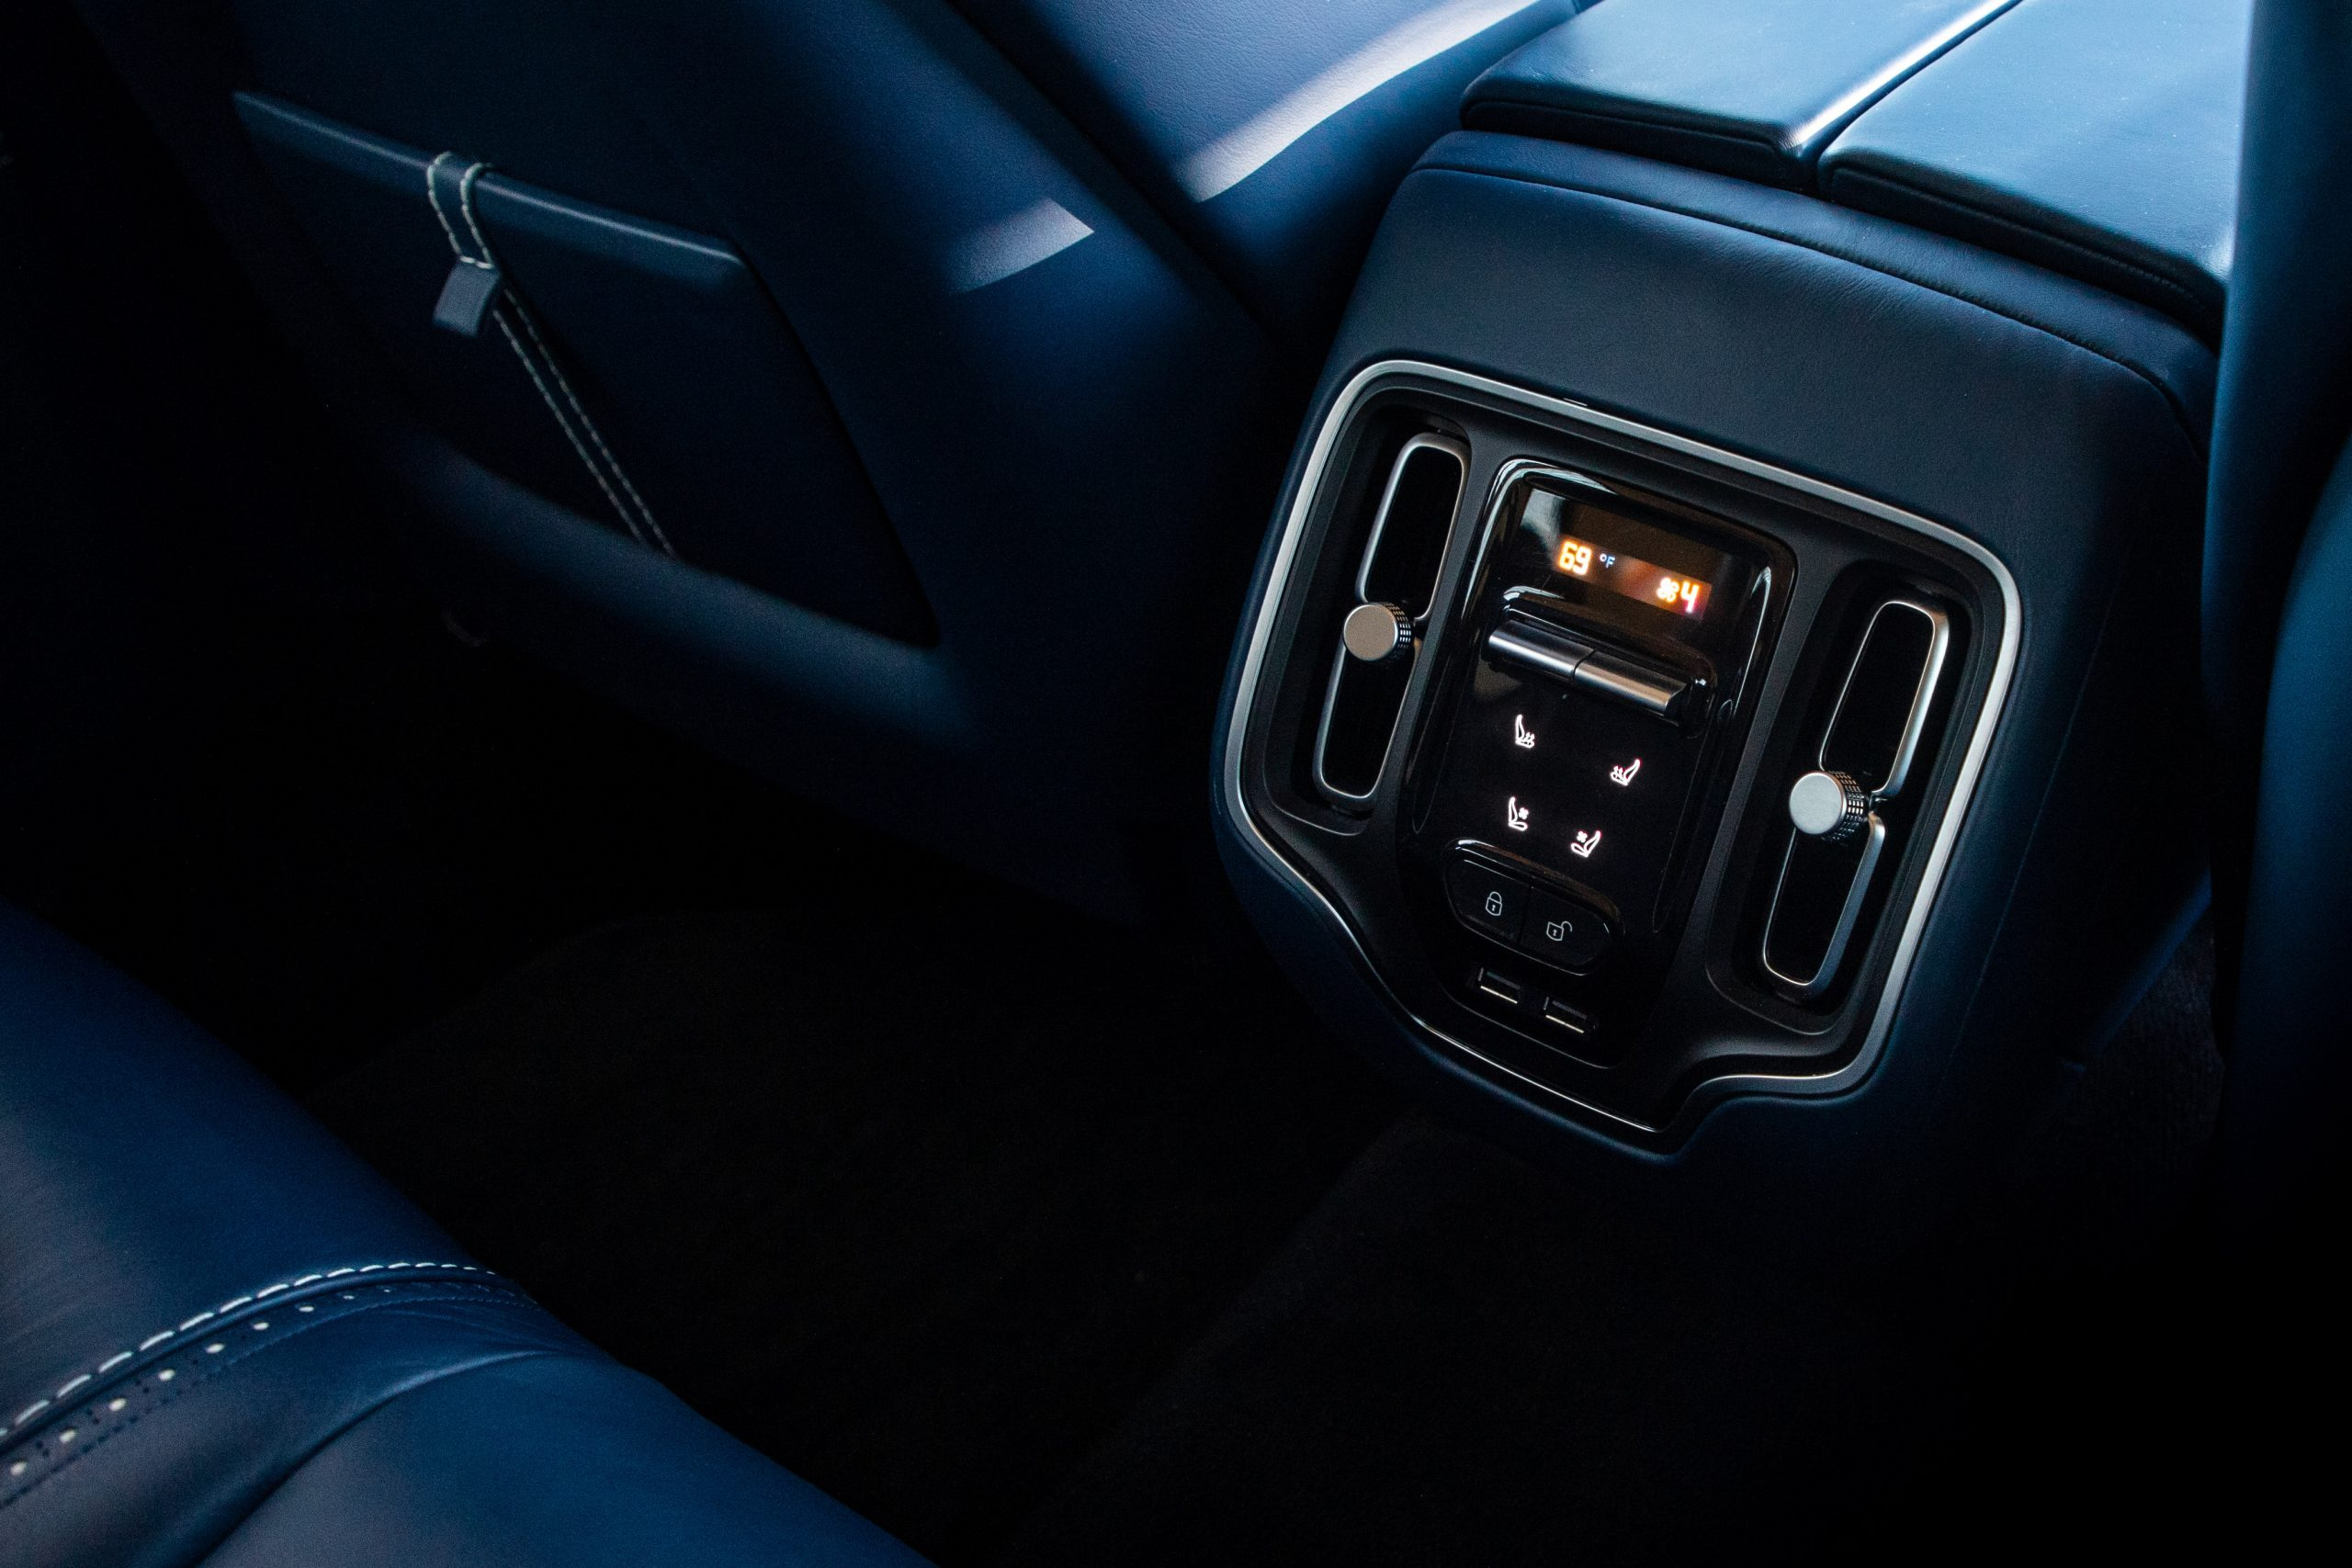 2021 Aston Martin DBX interior rear climate control